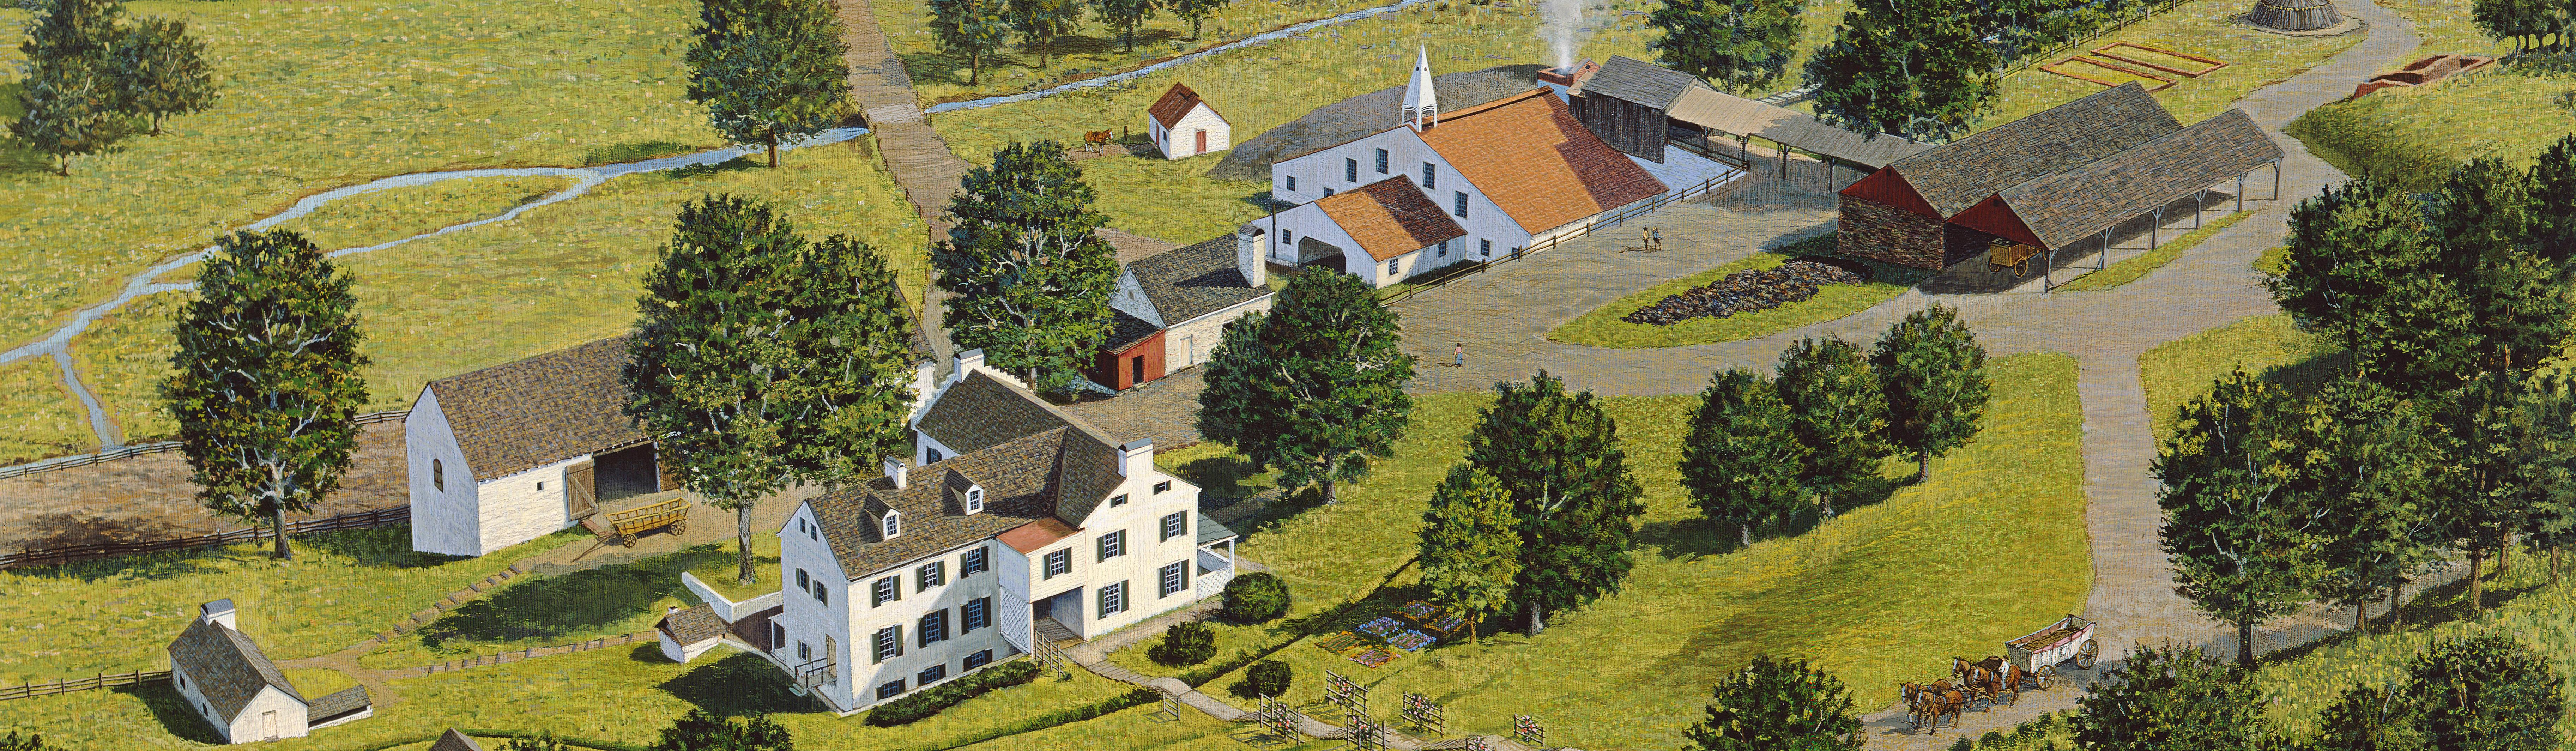 hopewell furnace national historic site u s national park service